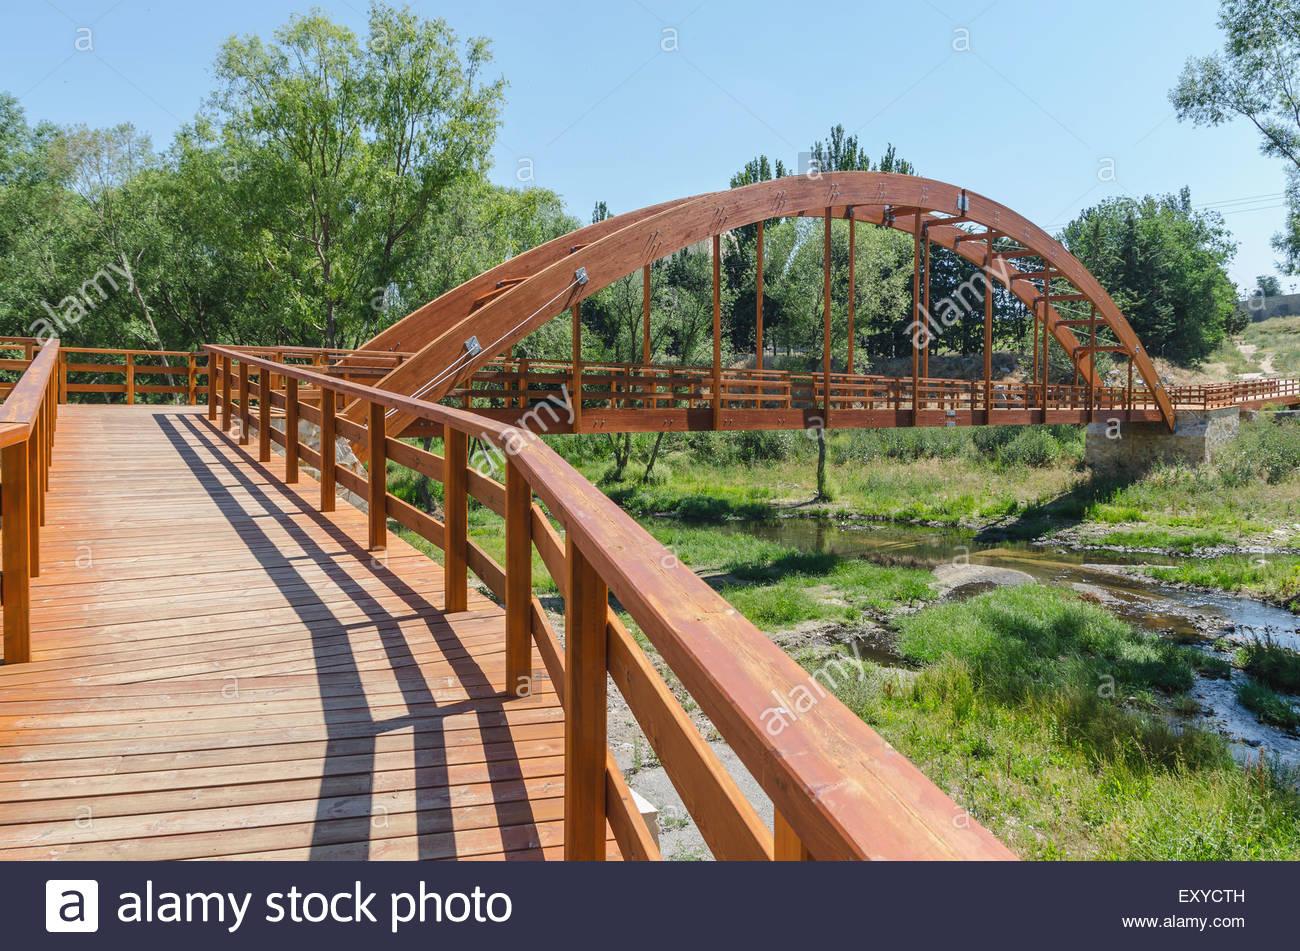 modern wooden bridge over river Adaja in the city of Avila, Spain - Stock Image